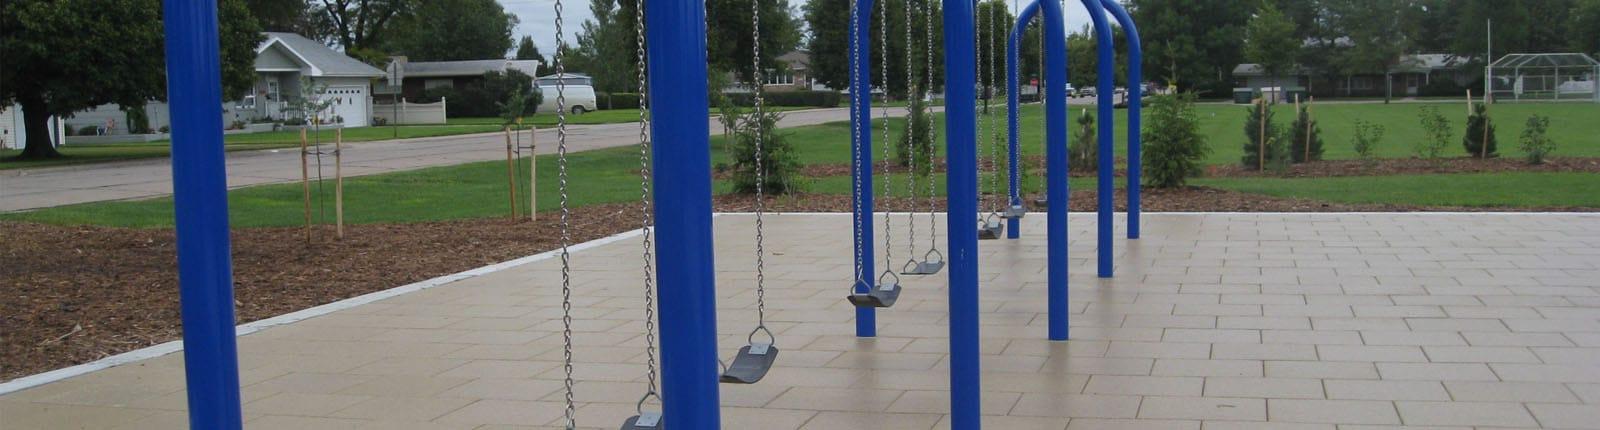 Modular Play Swing Set | Sterling West